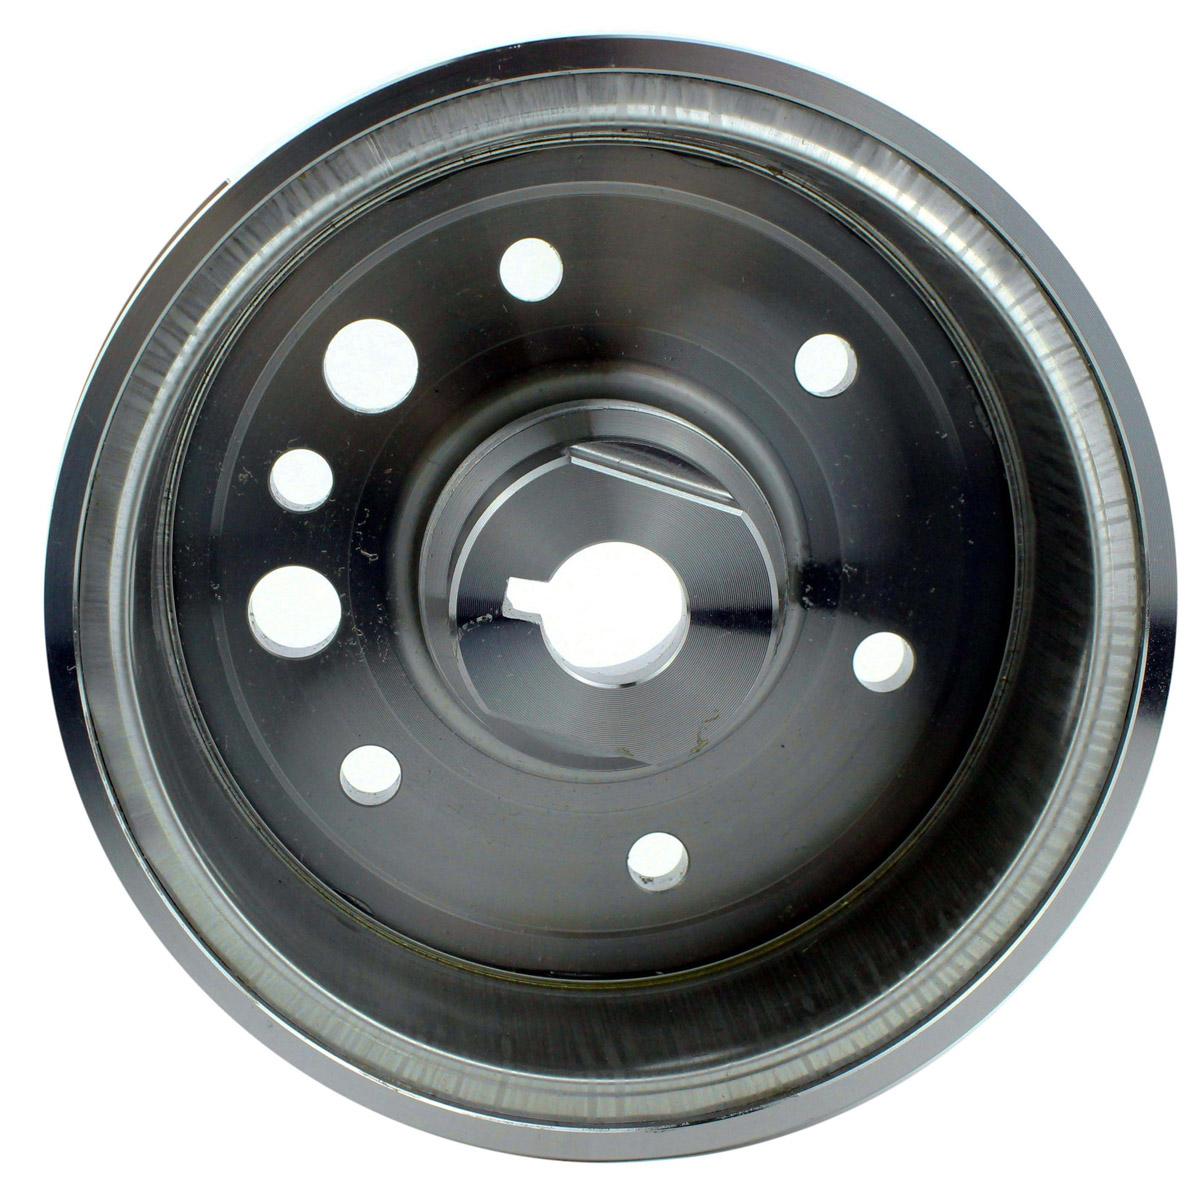 Kit-Flywheel-Flywheel-Puller-Gasket-For-Arctic-cat-TBX-400-4x4-Auto-2004-2005